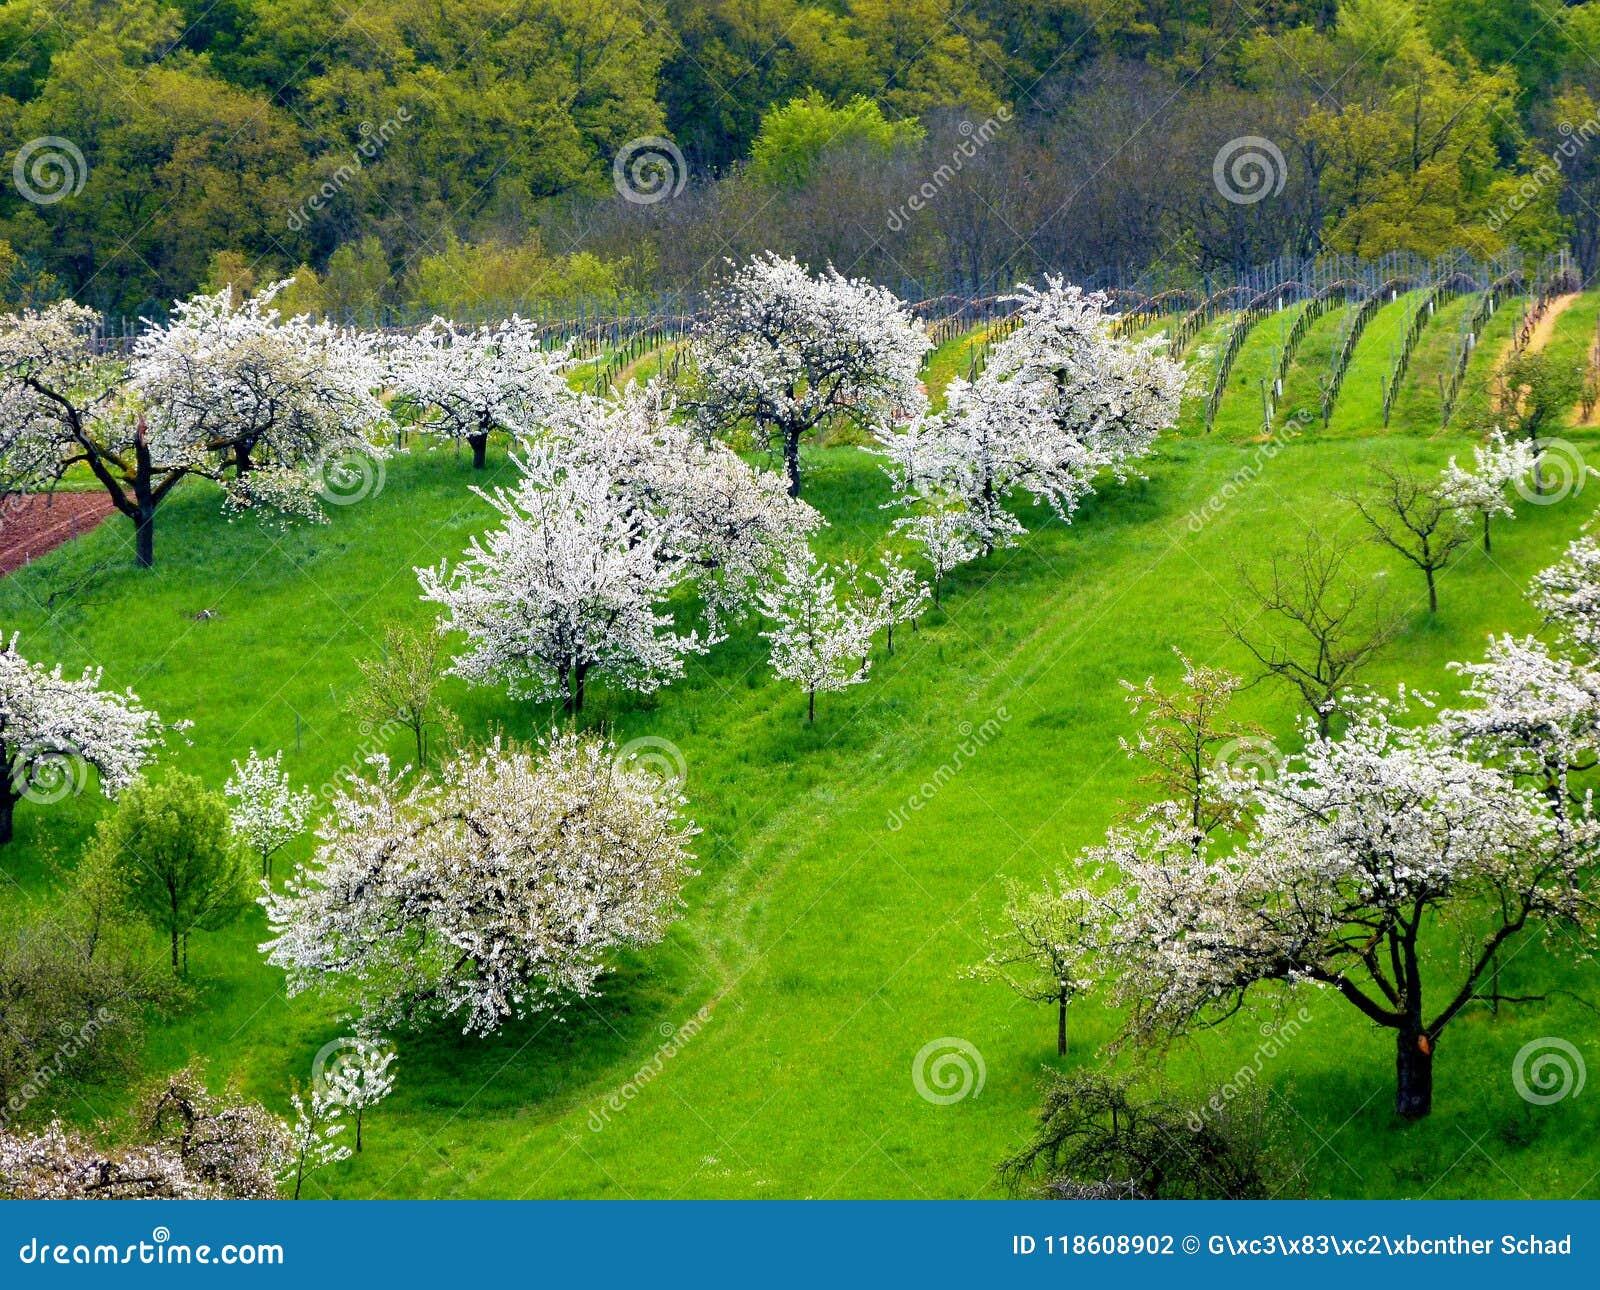 Fruit tree meadow with white flowering cherry trees stock photo download fruit tree meadow with white flowering cherry trees stock photo image of tree mightylinksfo